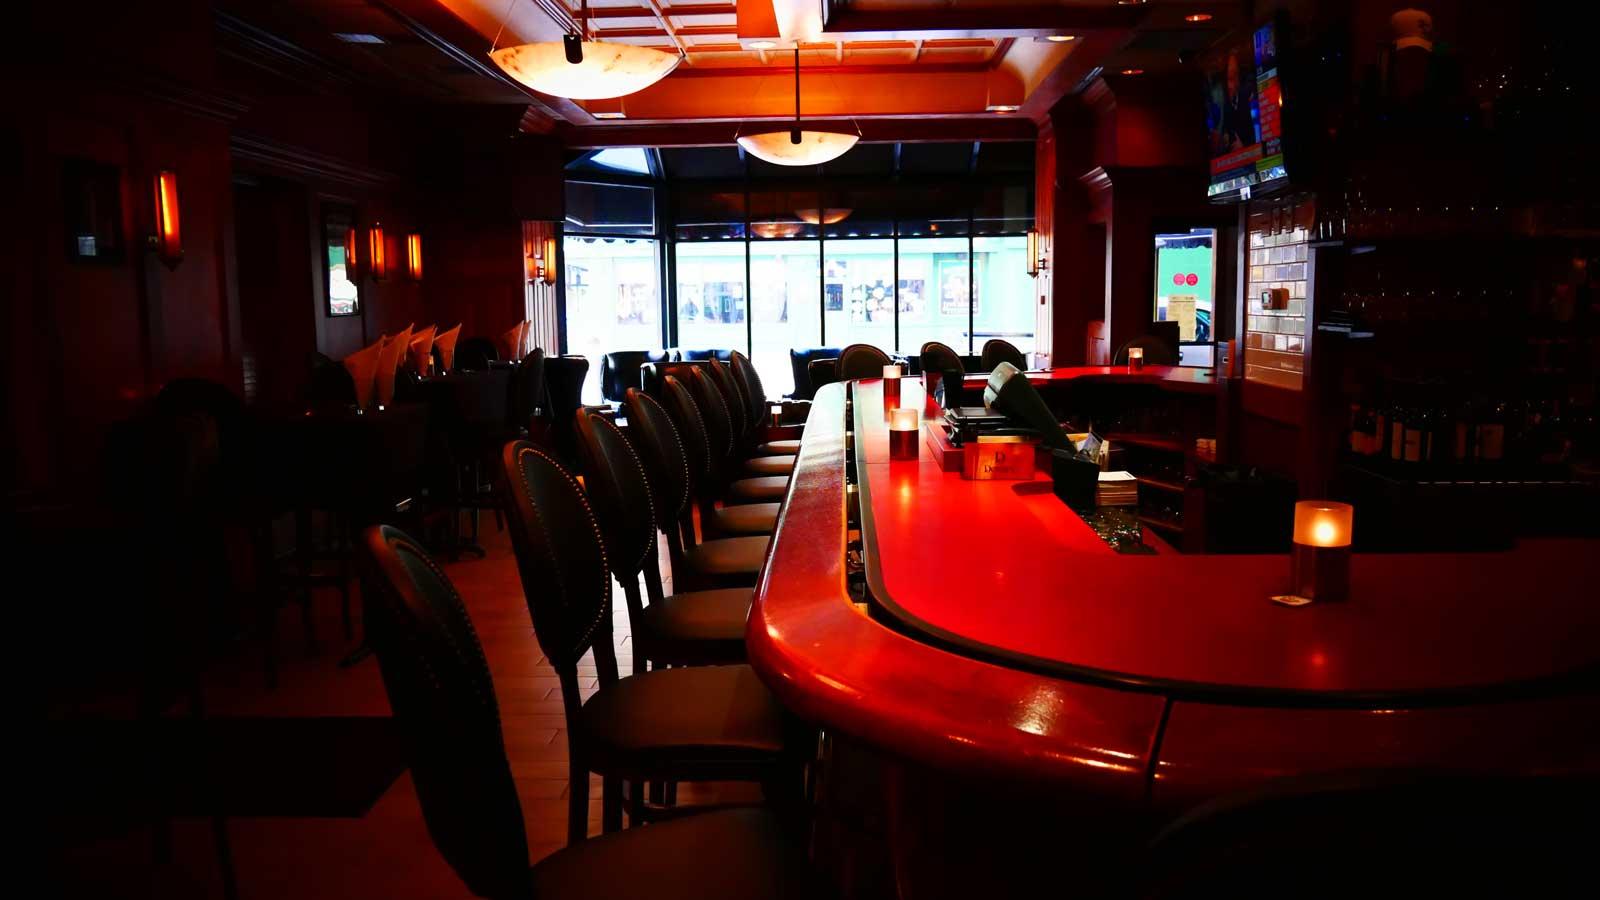 inside-best-steakhouse-milwaukee-wi.jpg